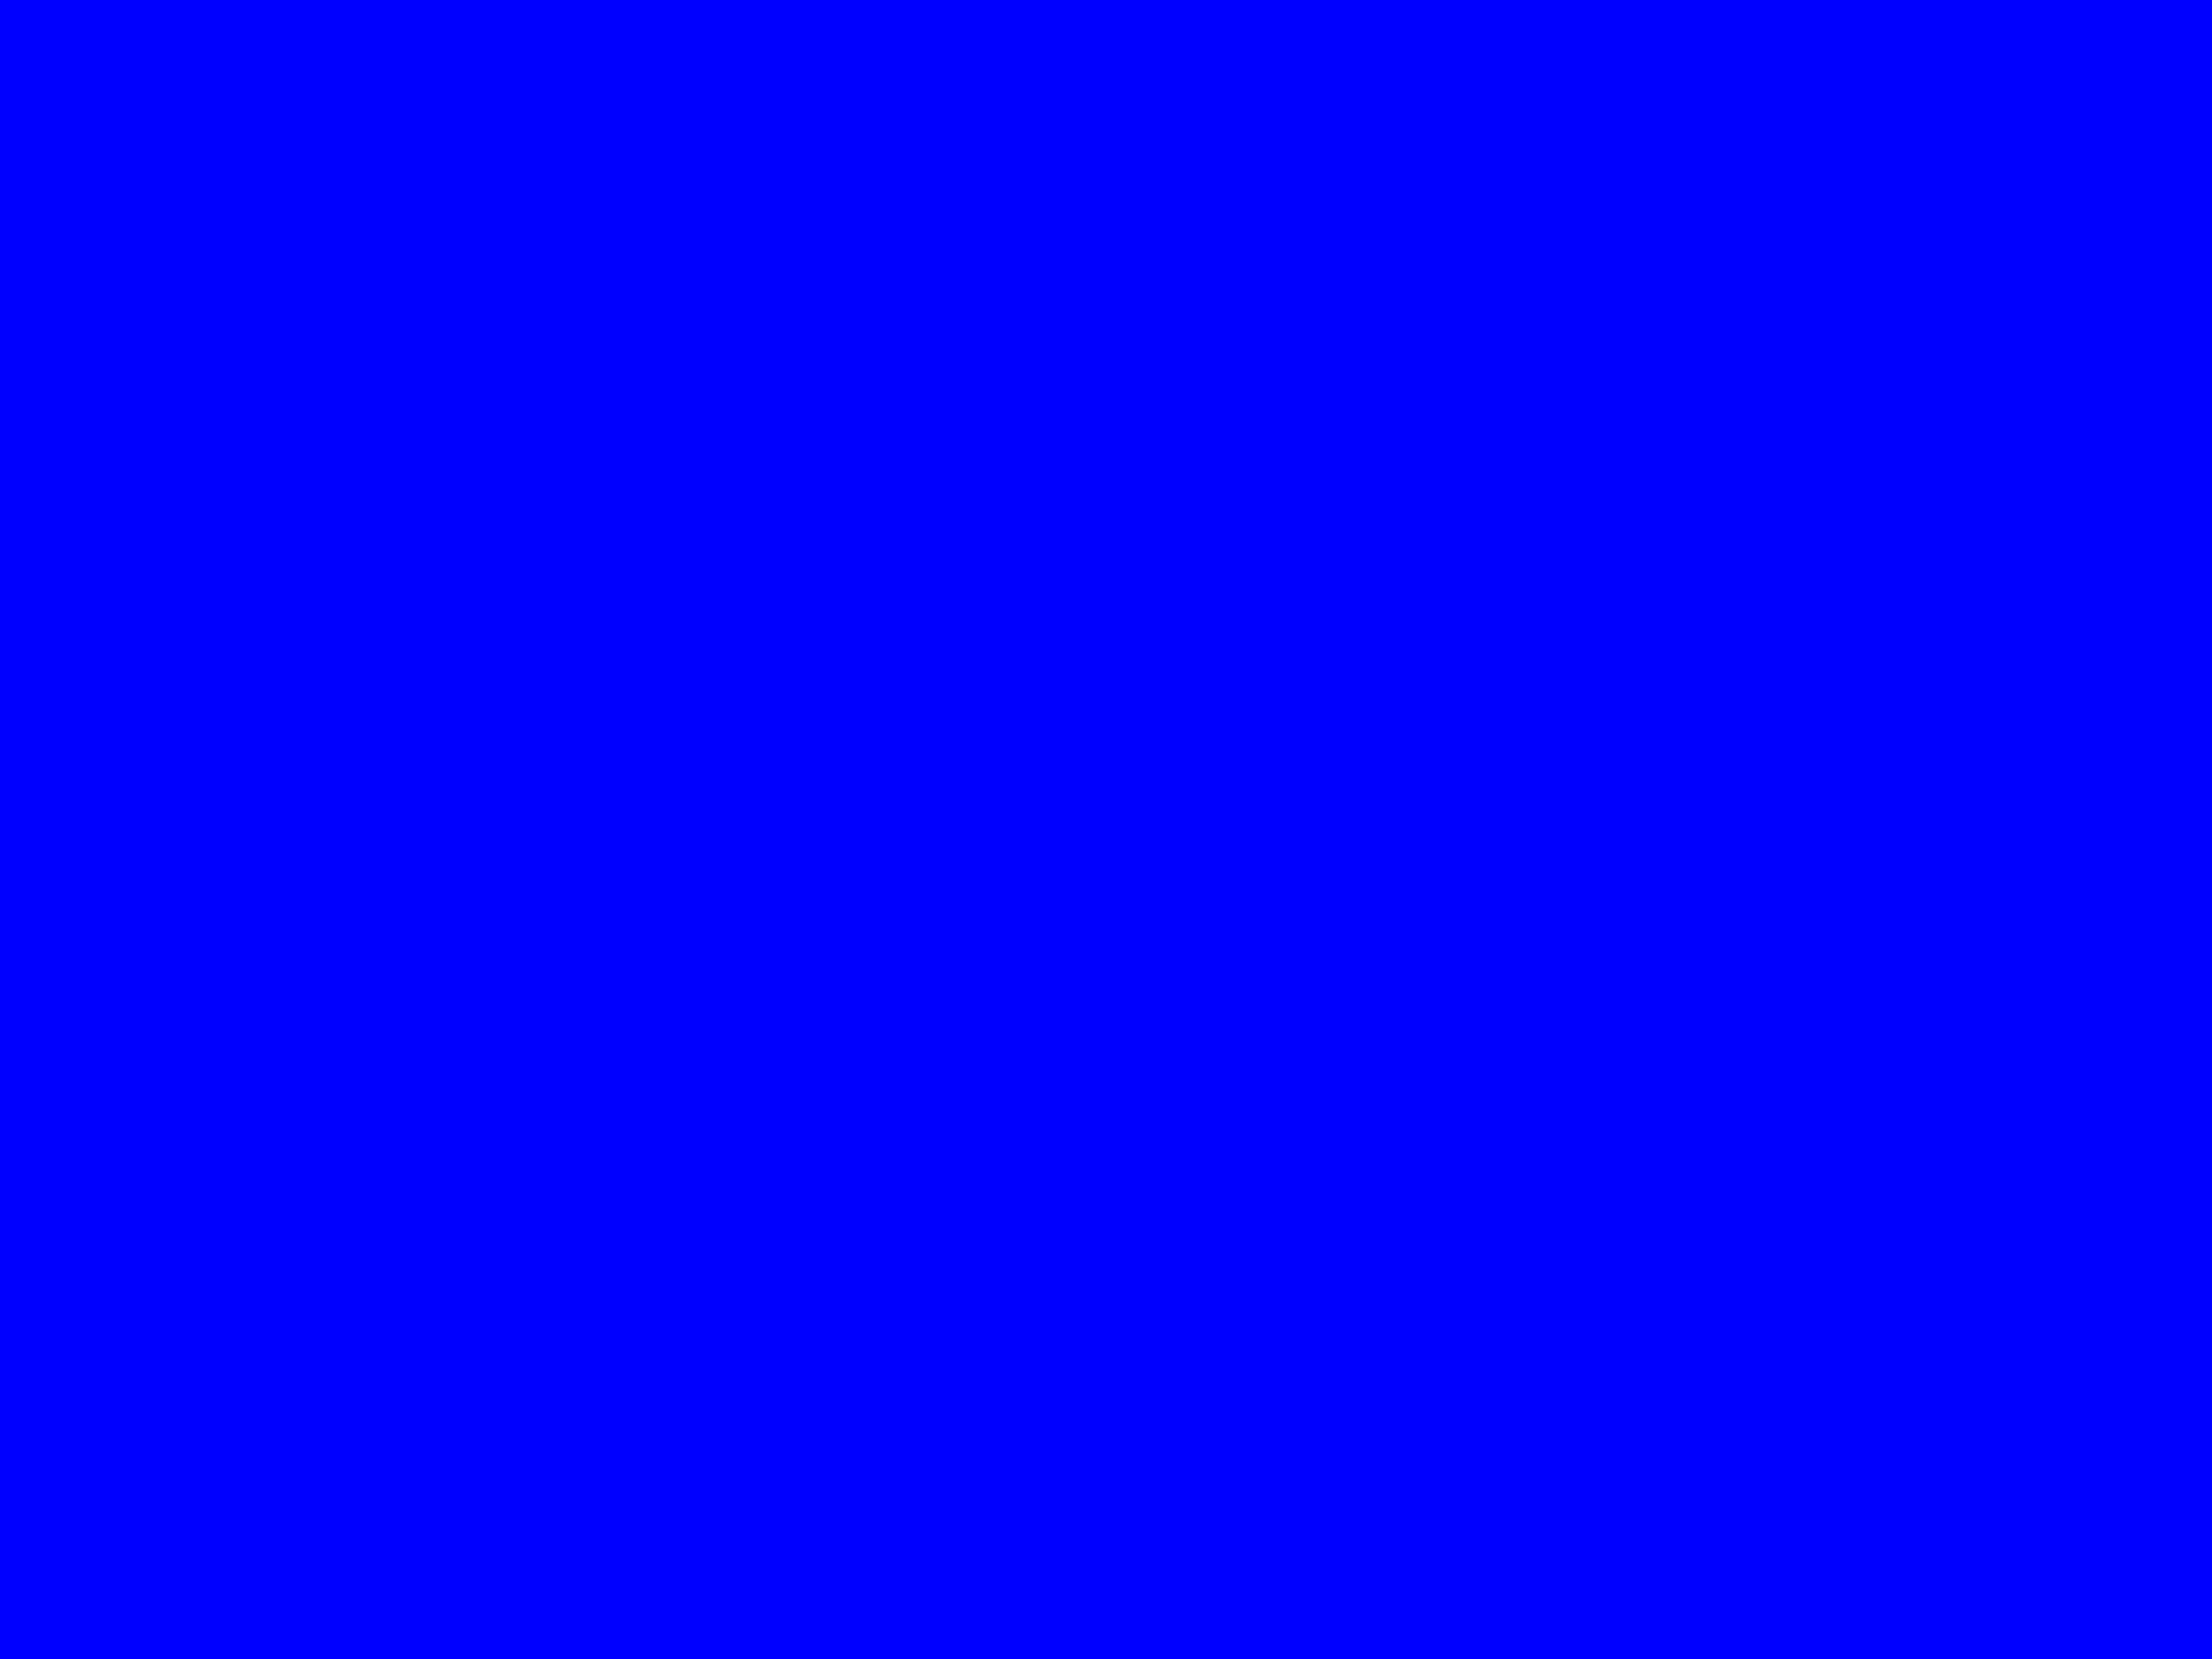 Ich bin blau